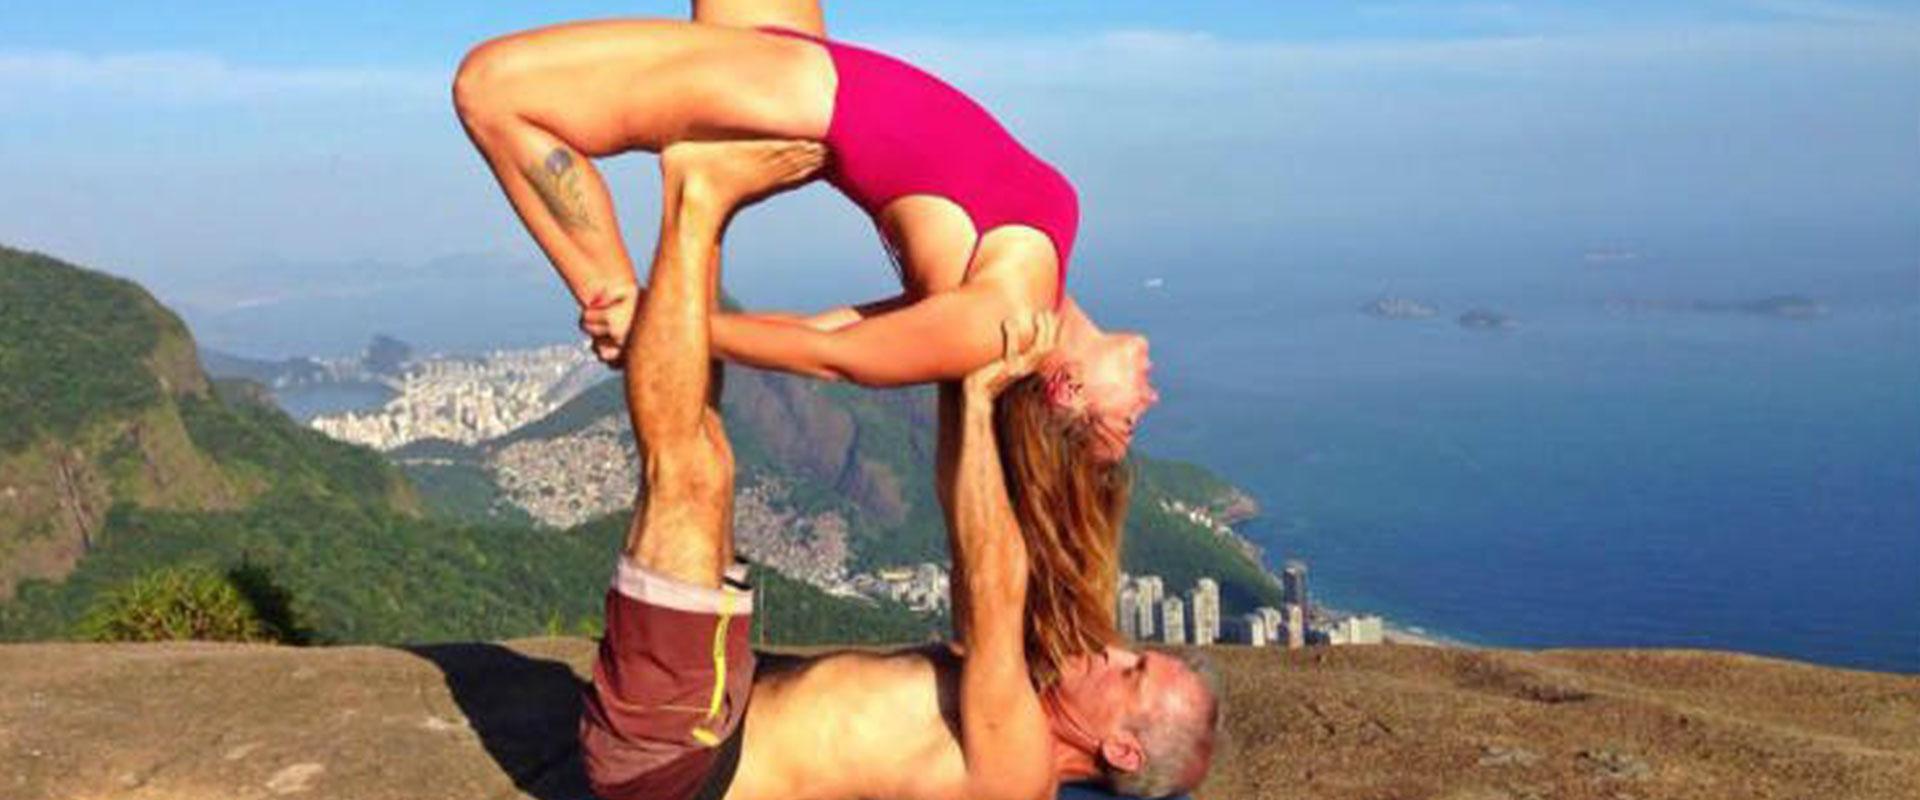 A couple doing a creative yoga pose on top of a mountain